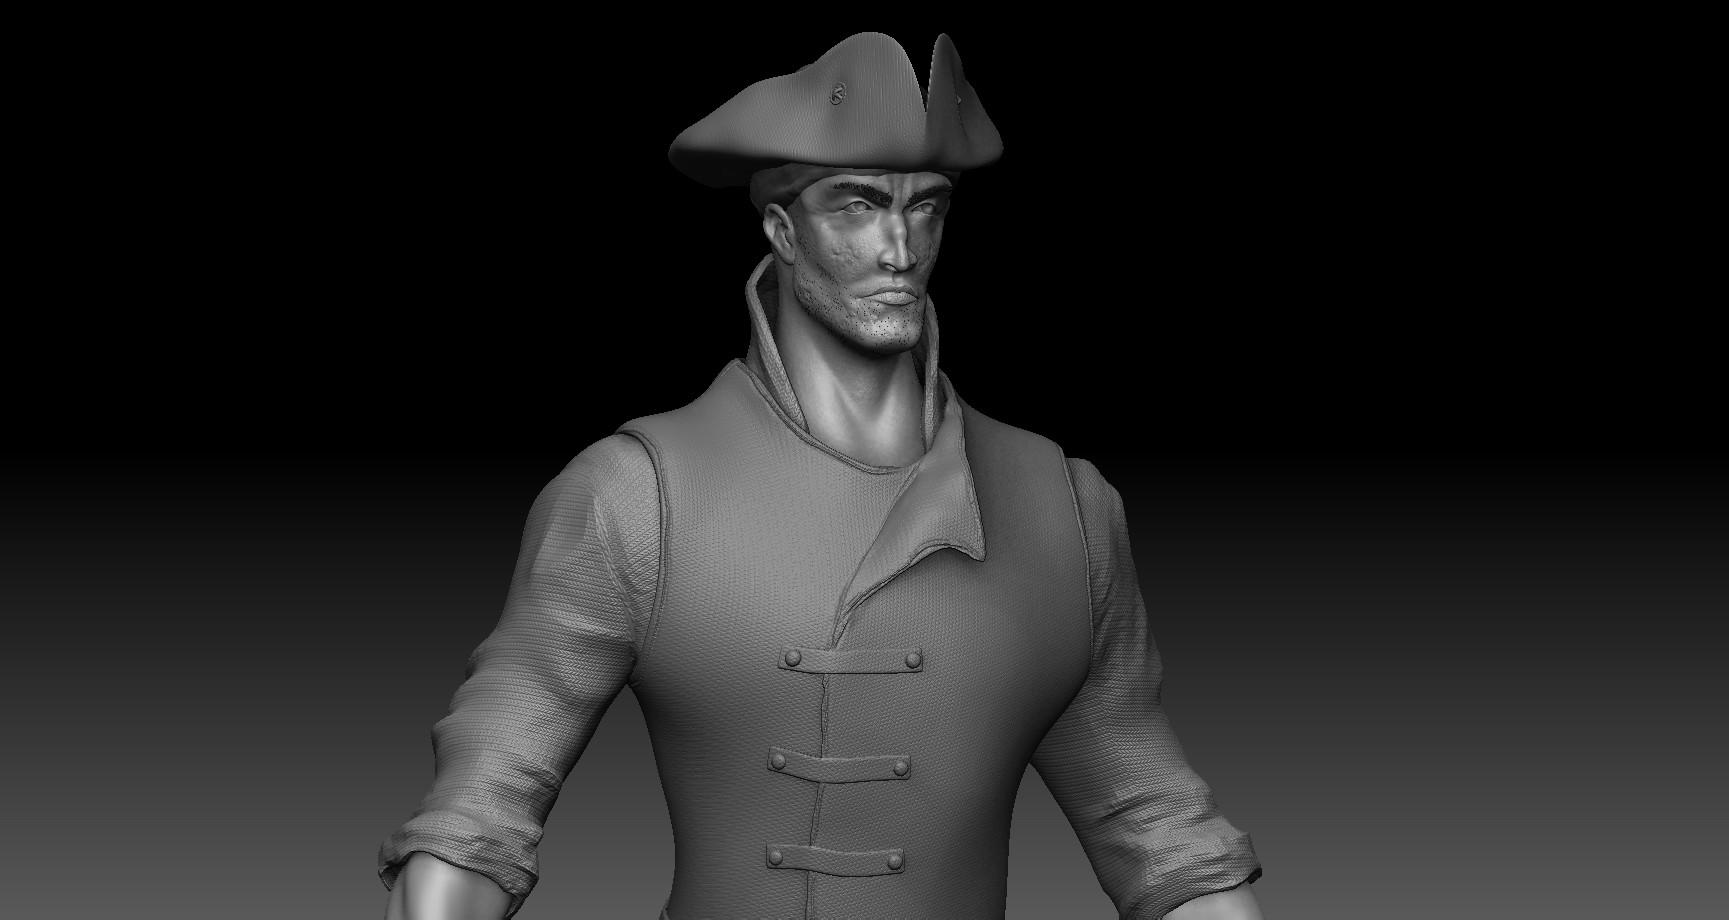 ArtStation - Pirate Model, Manu Prasad